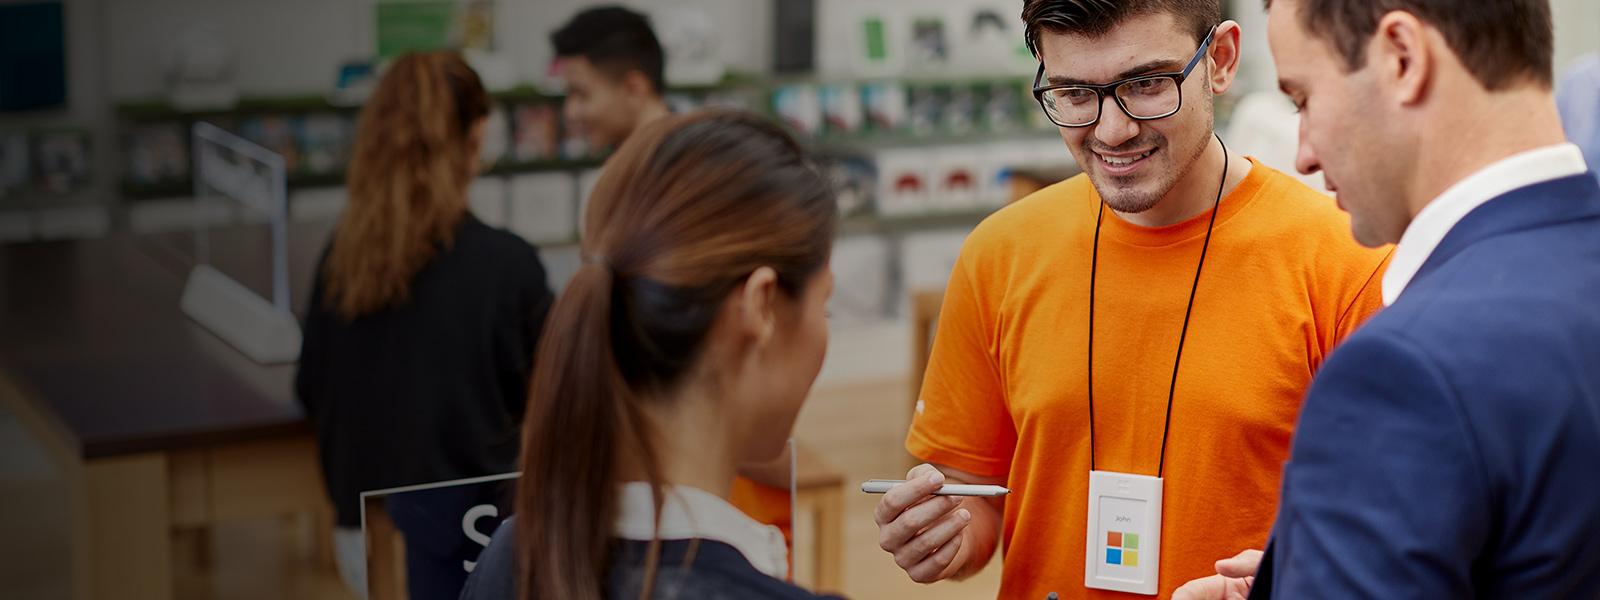 Microsoft staff helps customers